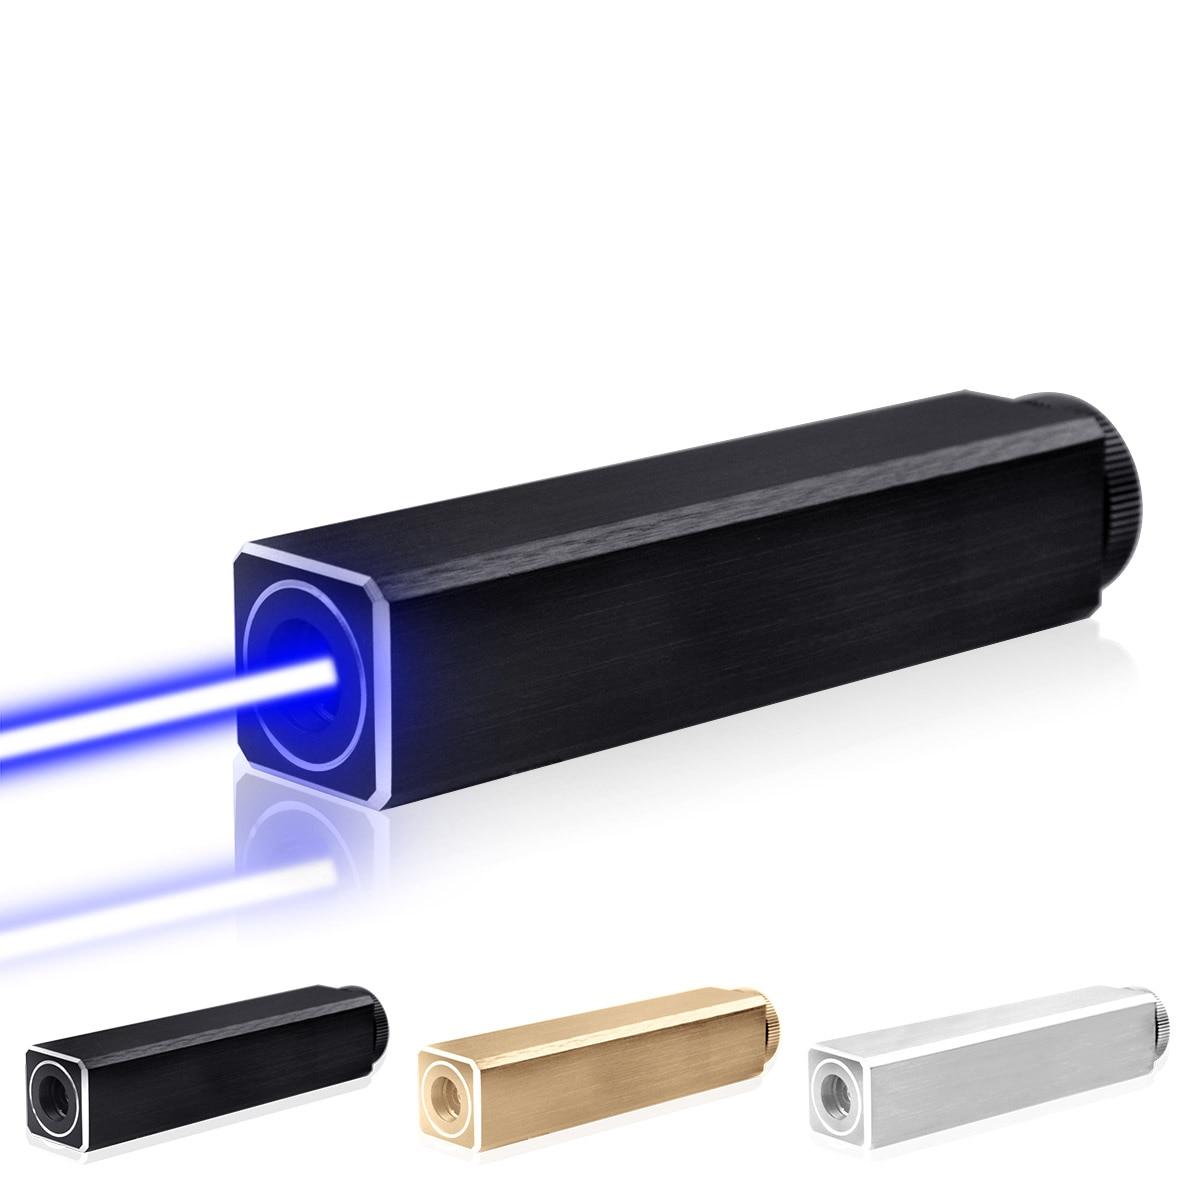 CWLASER 532nm vert/450nm bleu/405nm violet/650nm rouge pointeur Laser de forme carrée (3 couleurs) - 2